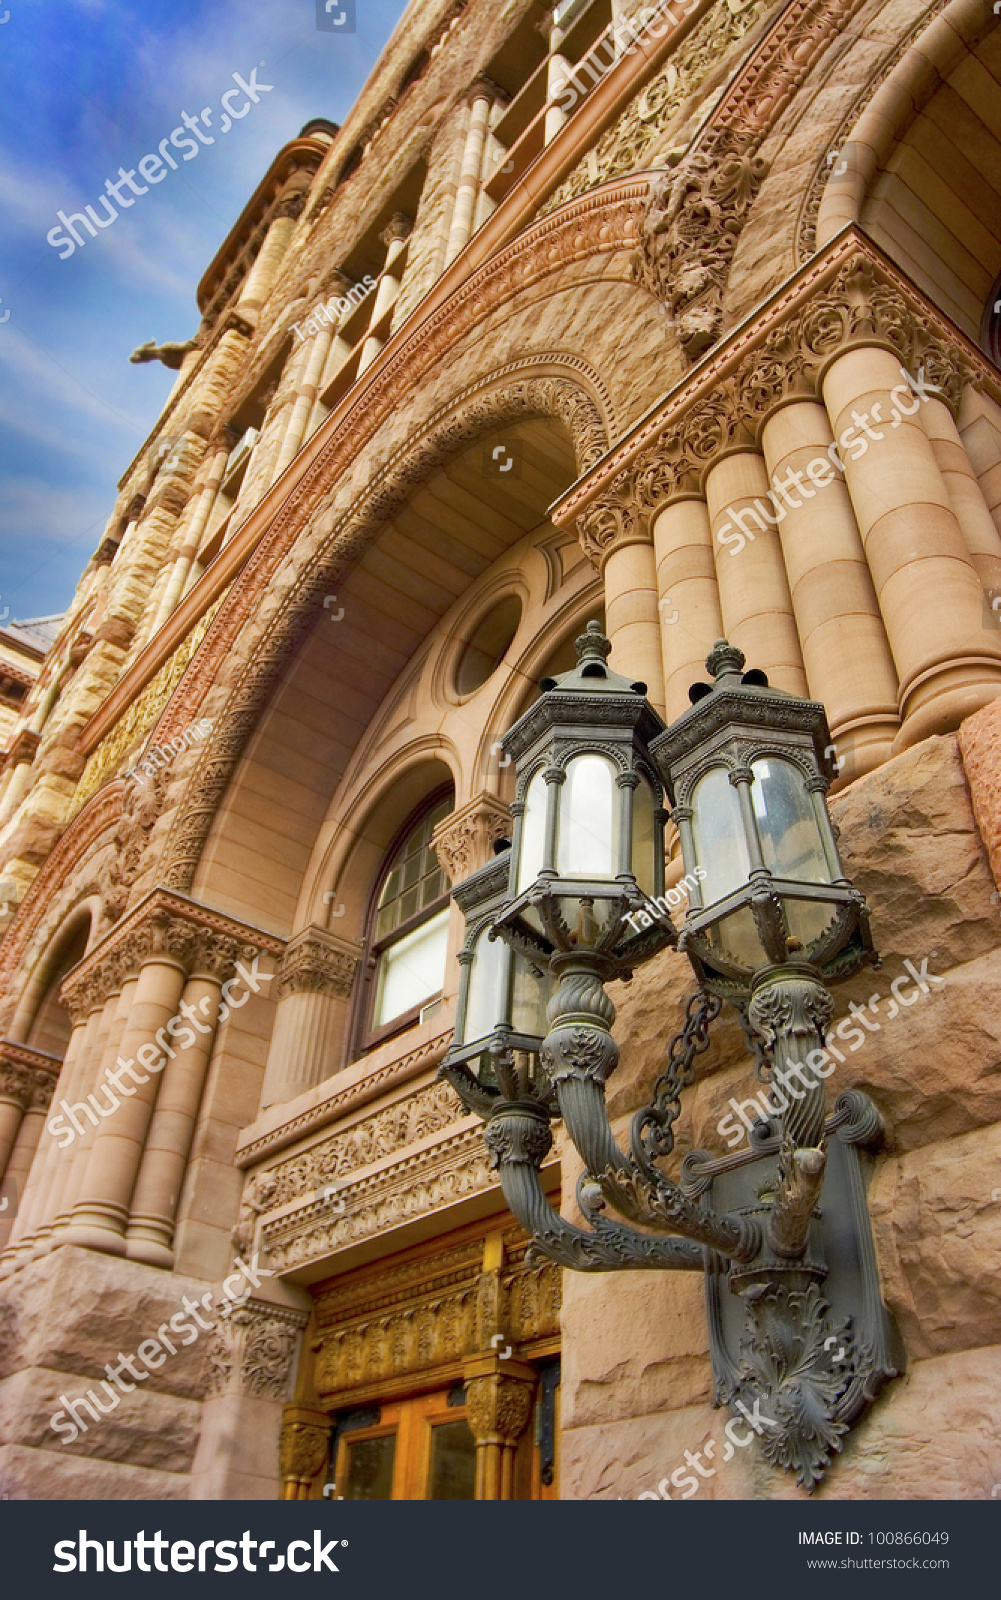 Street light on Old City Hall. Downtown Torornto.